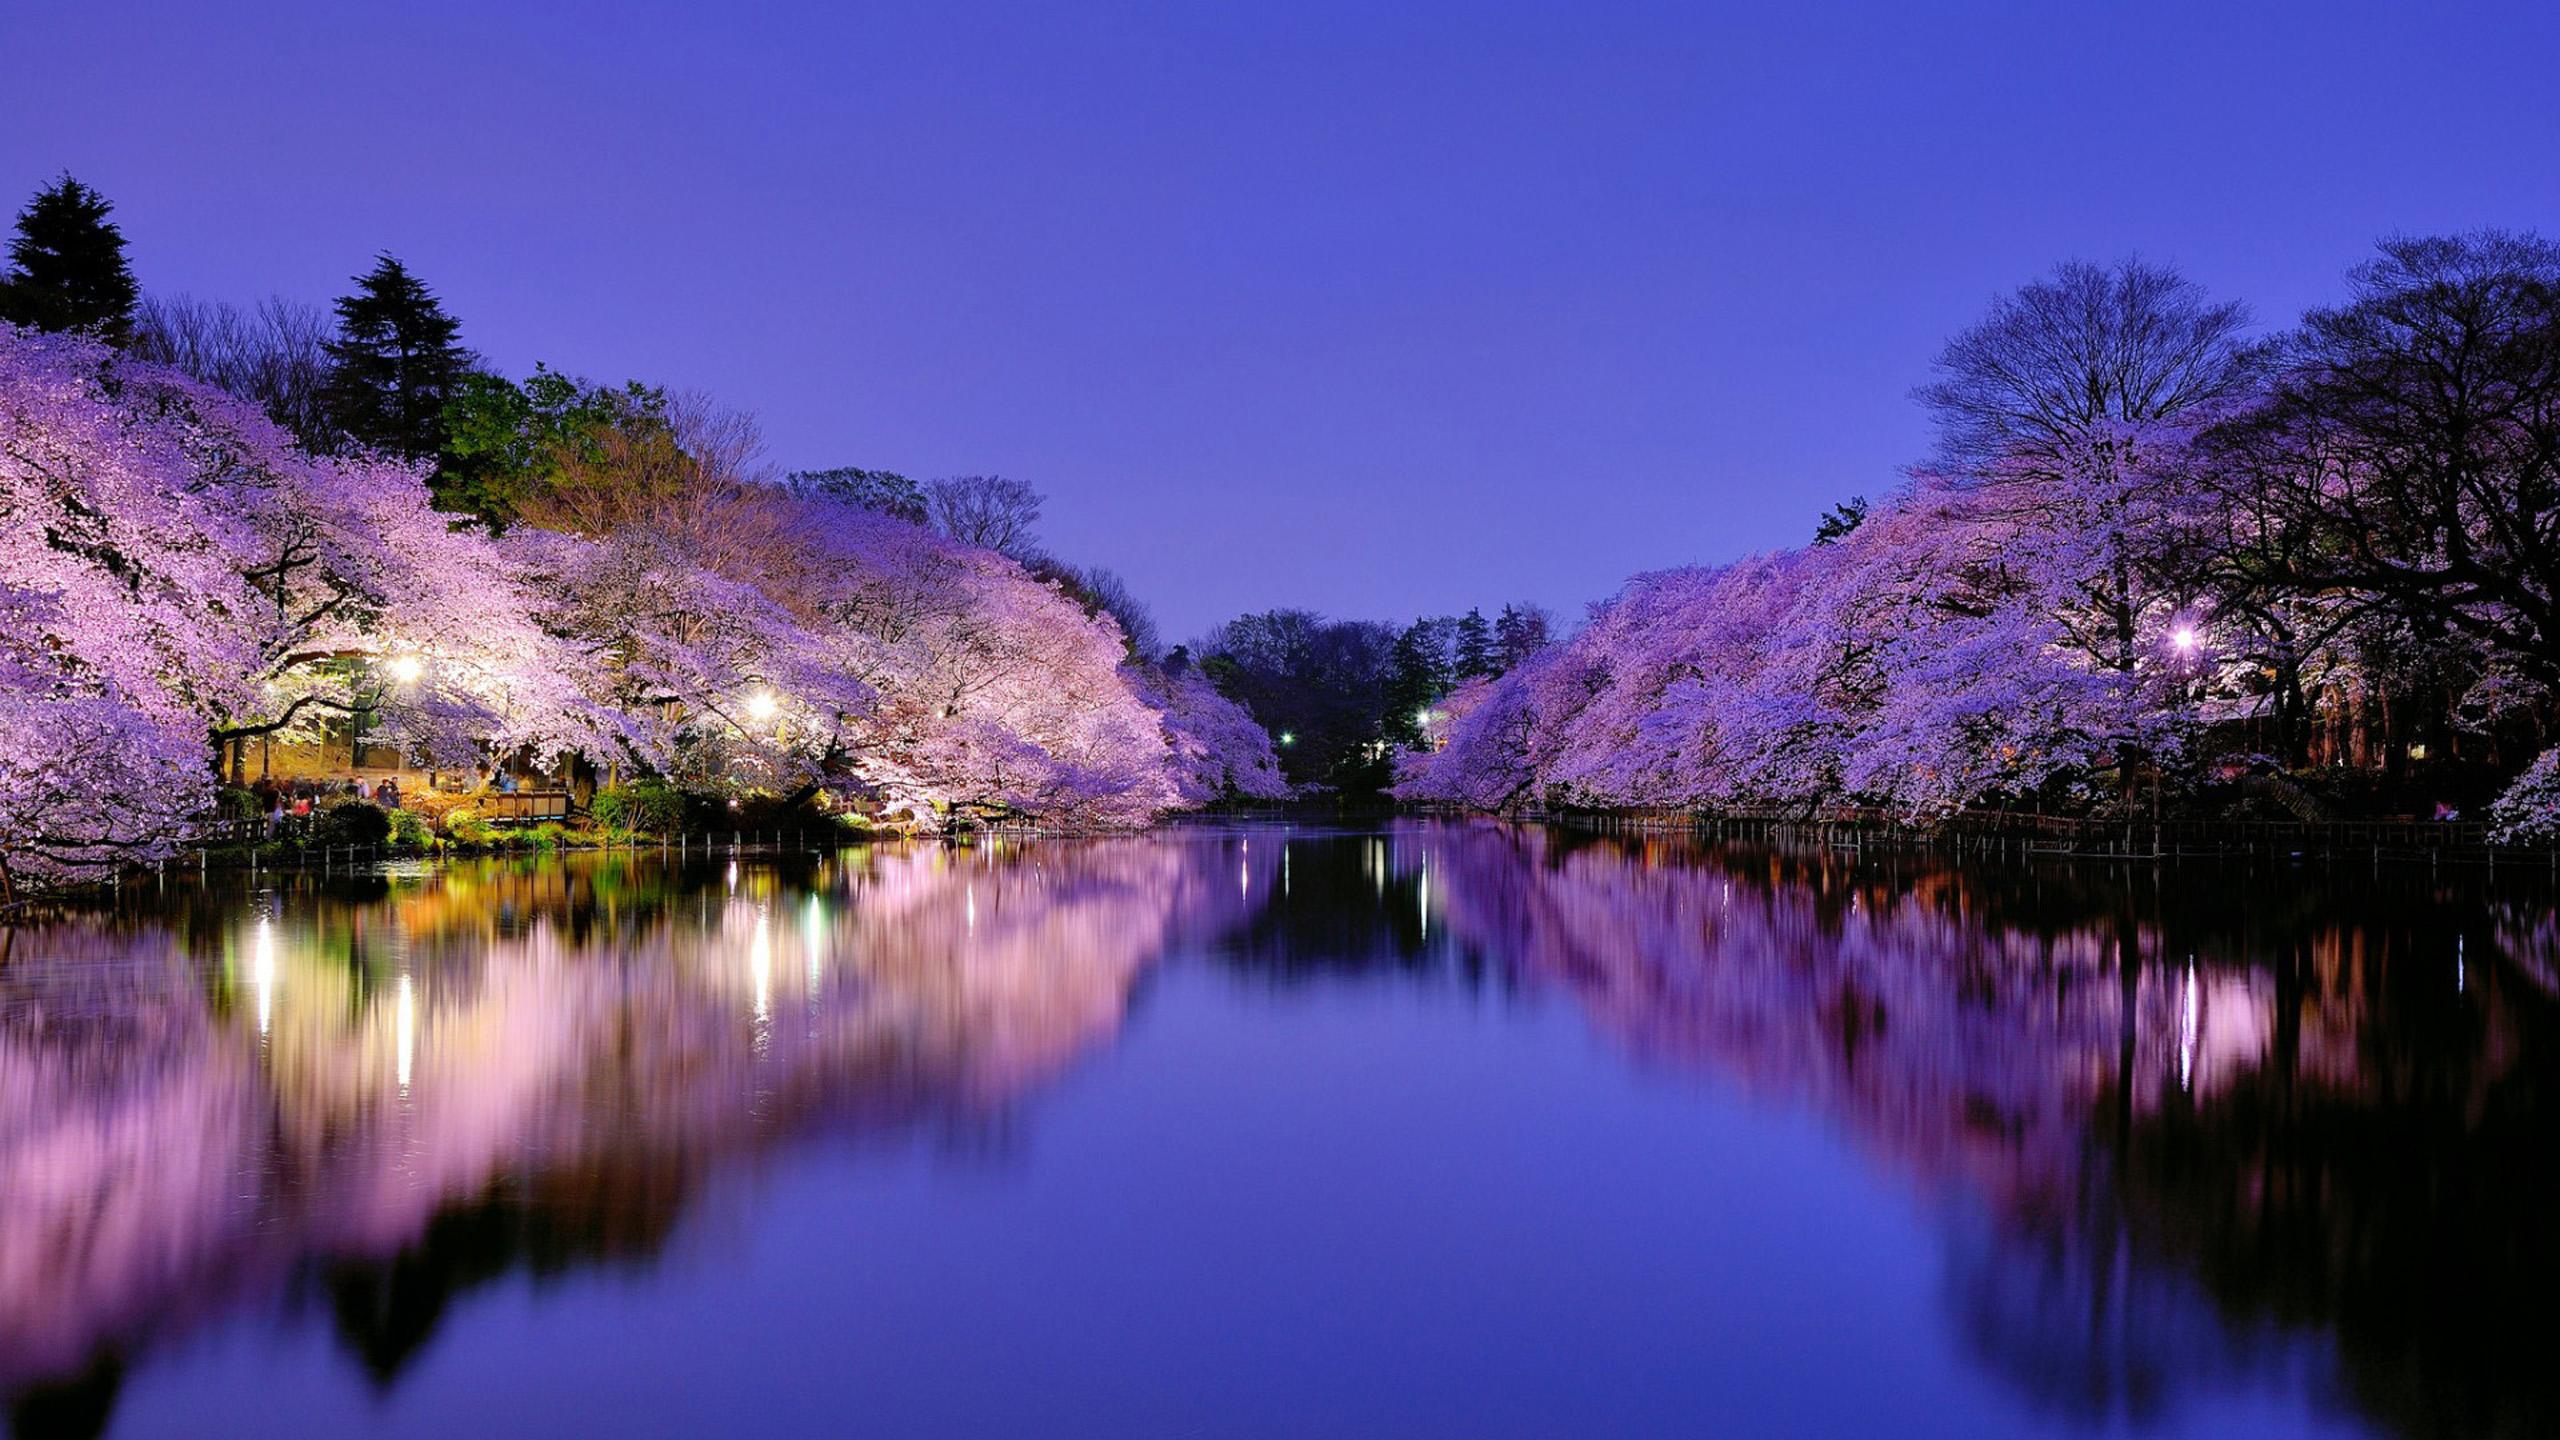 Spring in Japan Wallpapers HD download 2560x1440